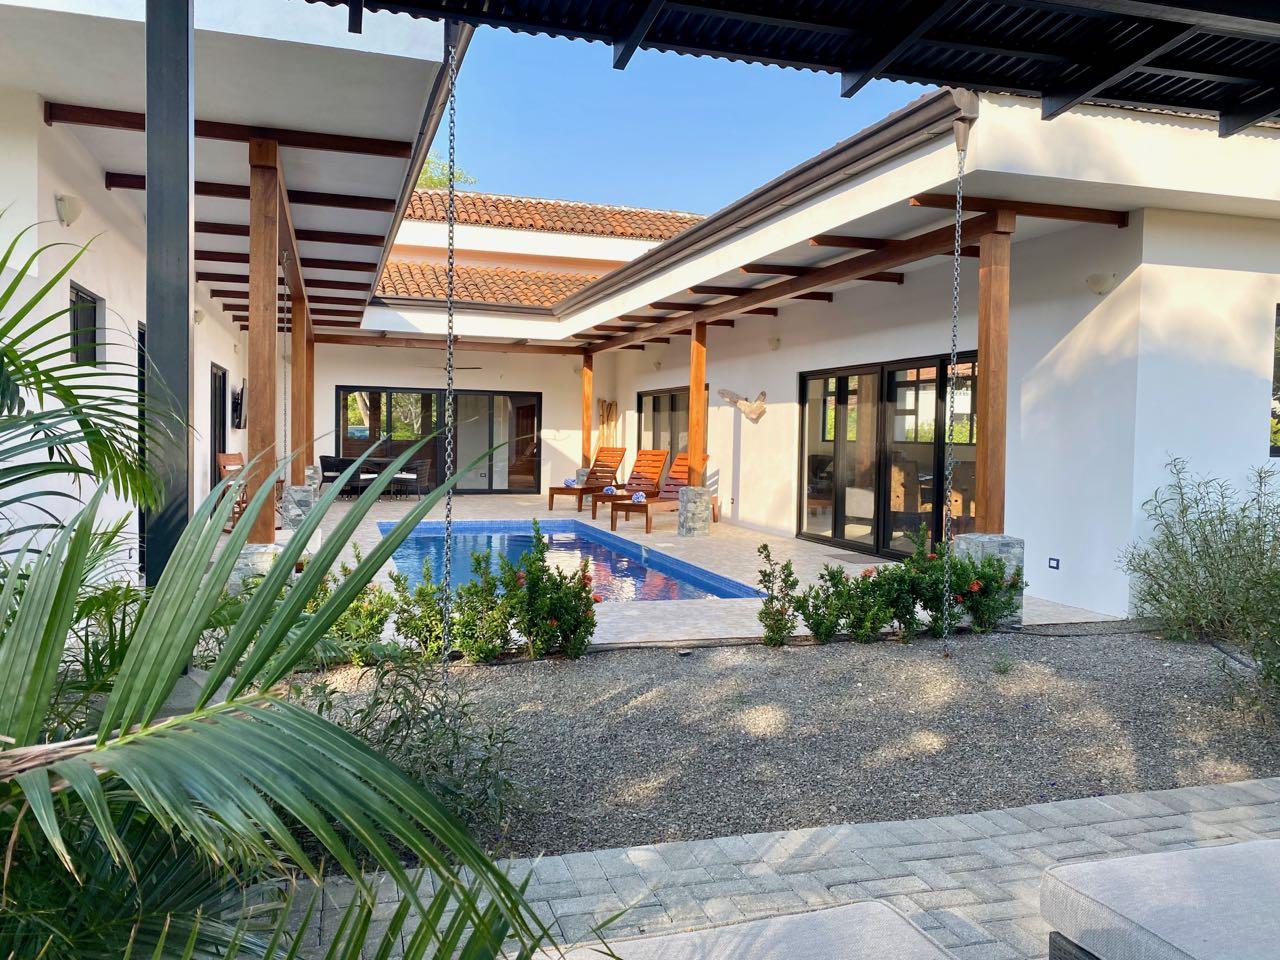 Beach House Costa Rica For Sale